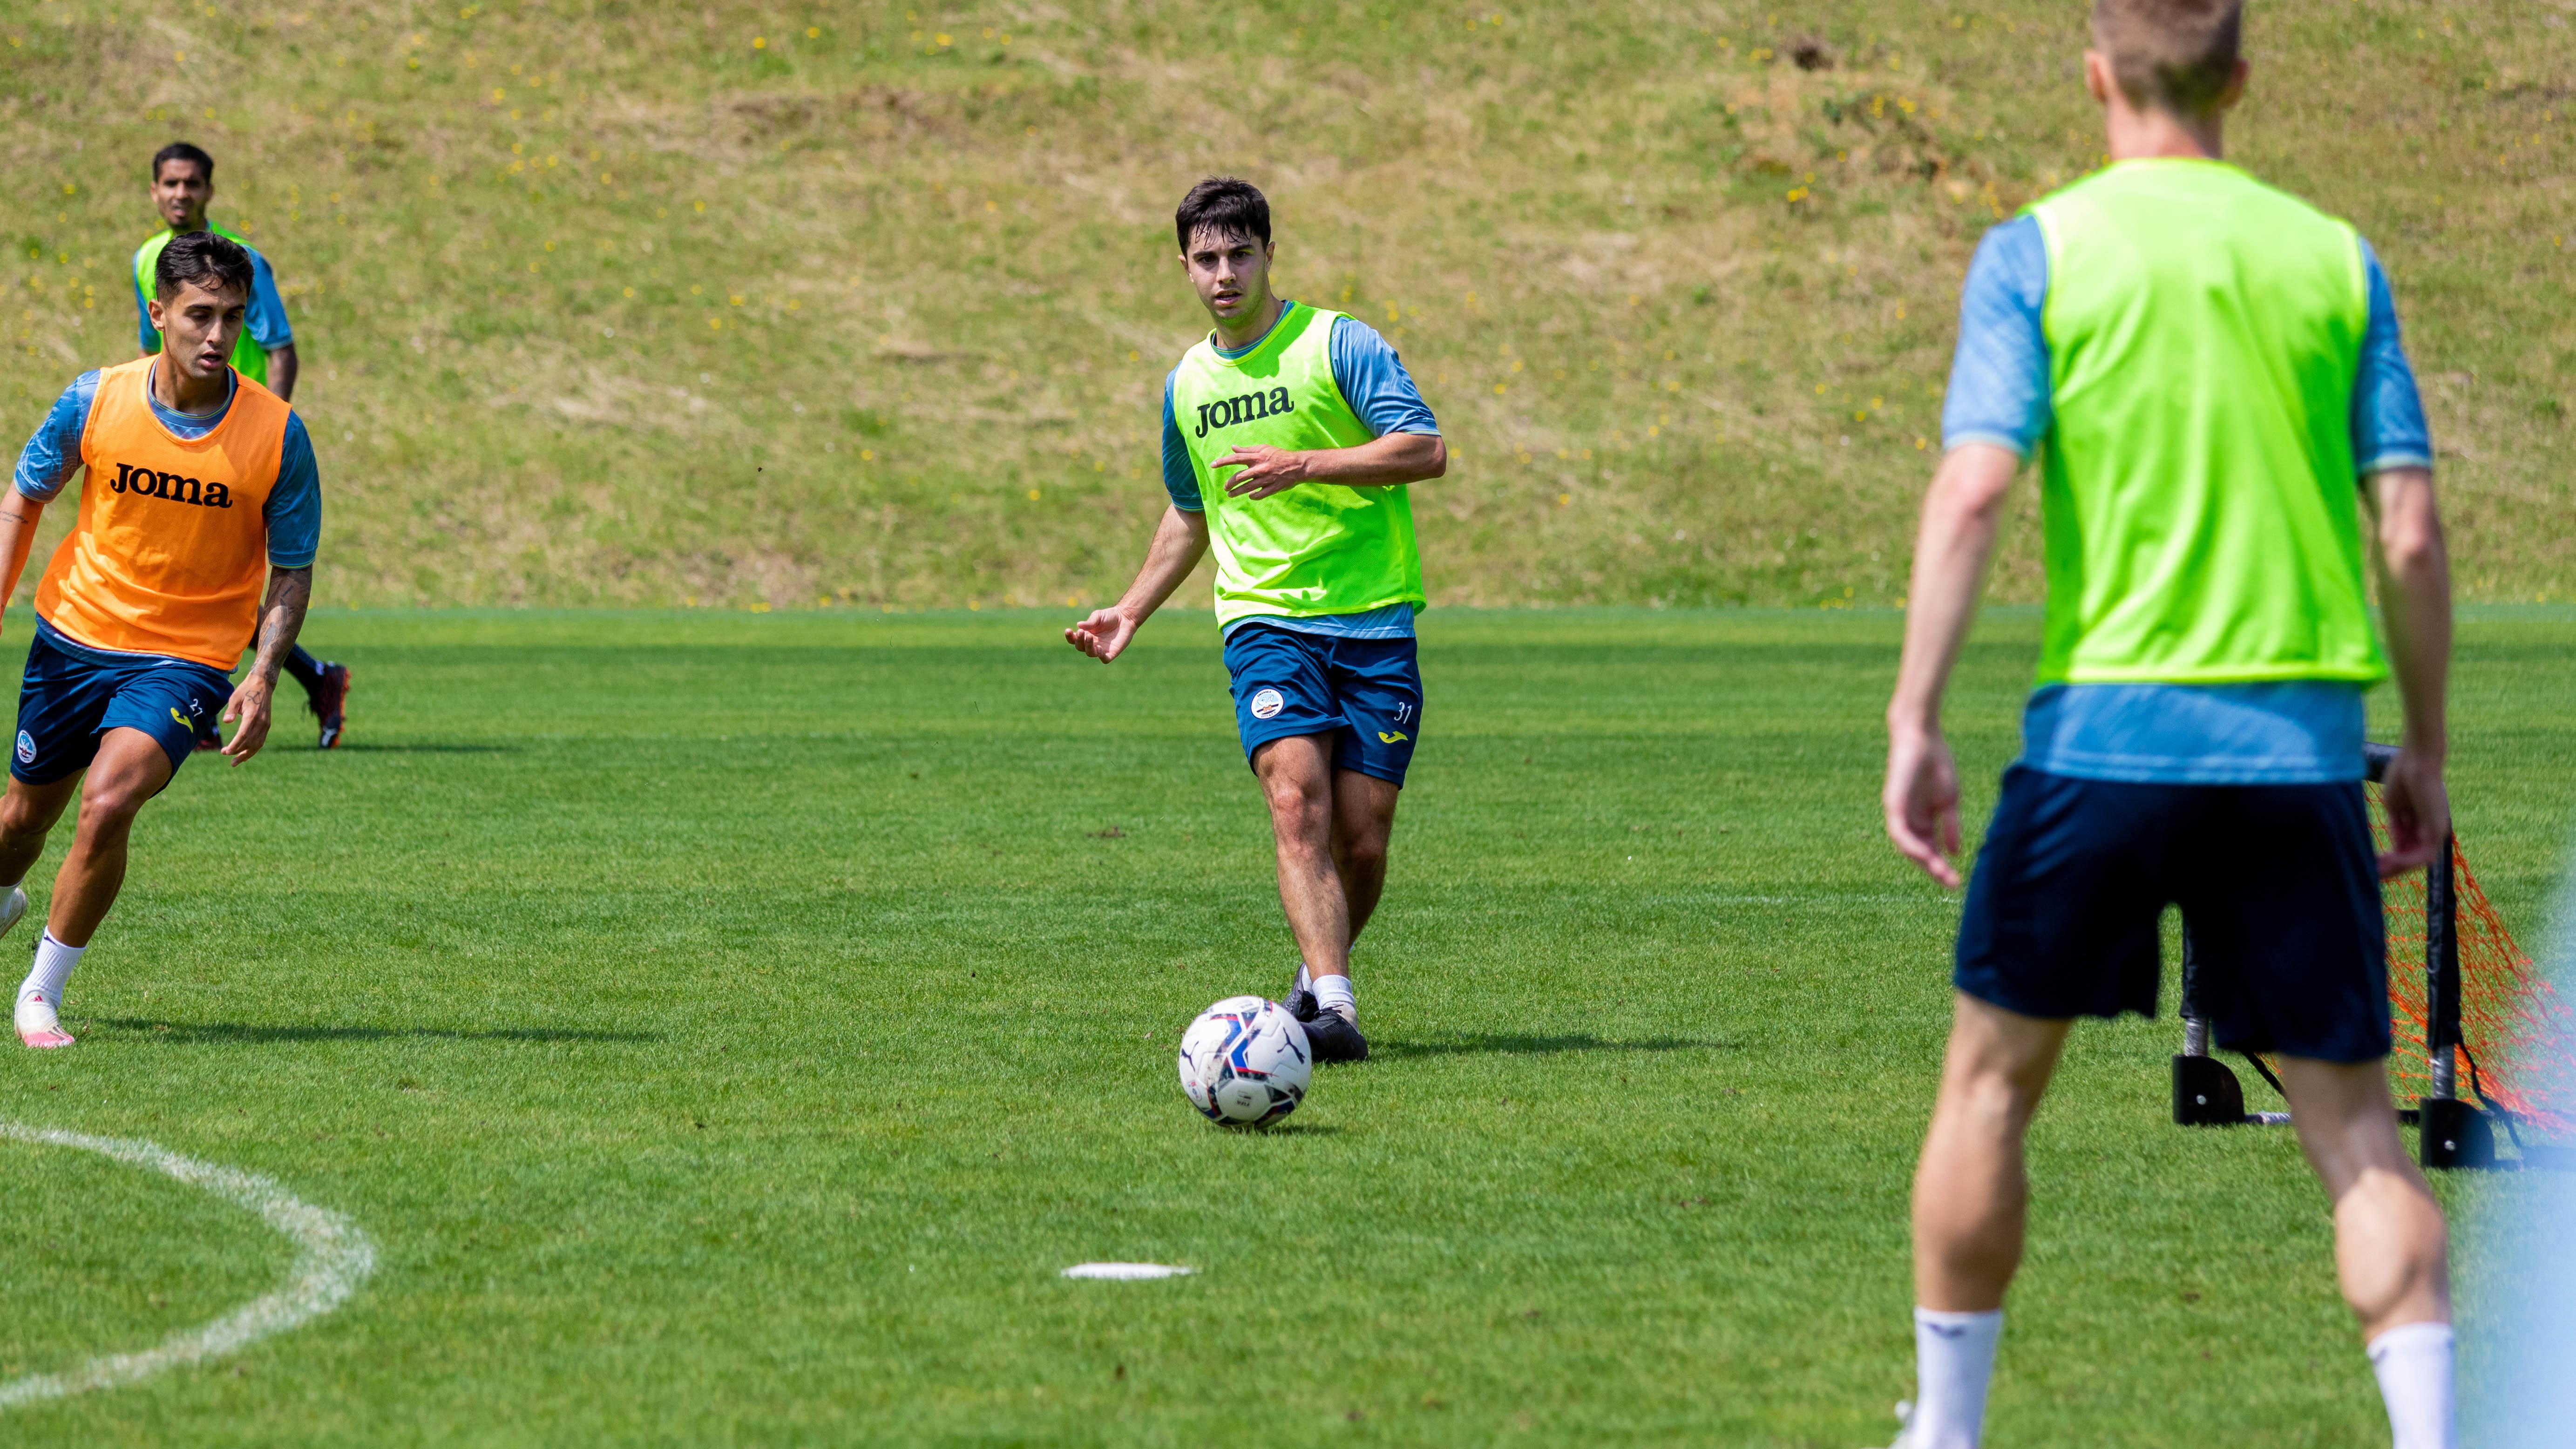 Swansea City training